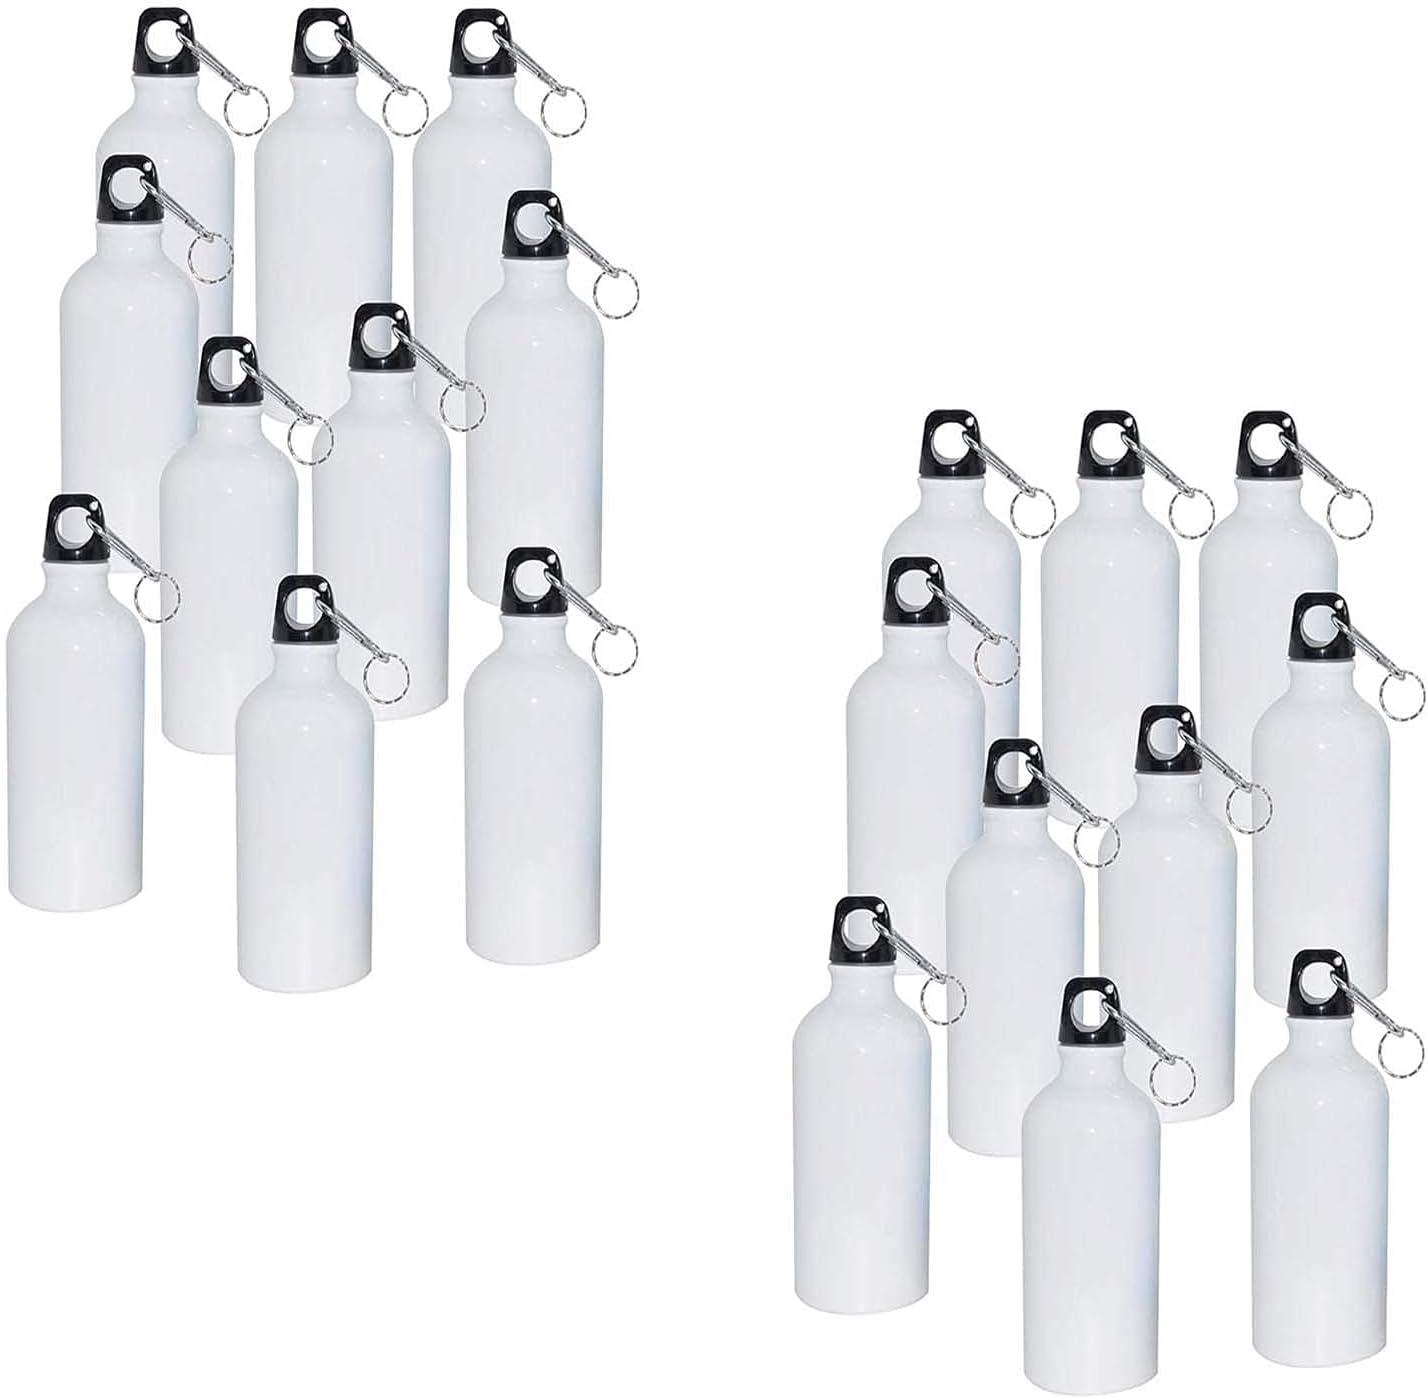 INTSUPERMAI Beauty products 20pcs 750ml White Blank Sublimation Aluminium Free Shipping New Coated